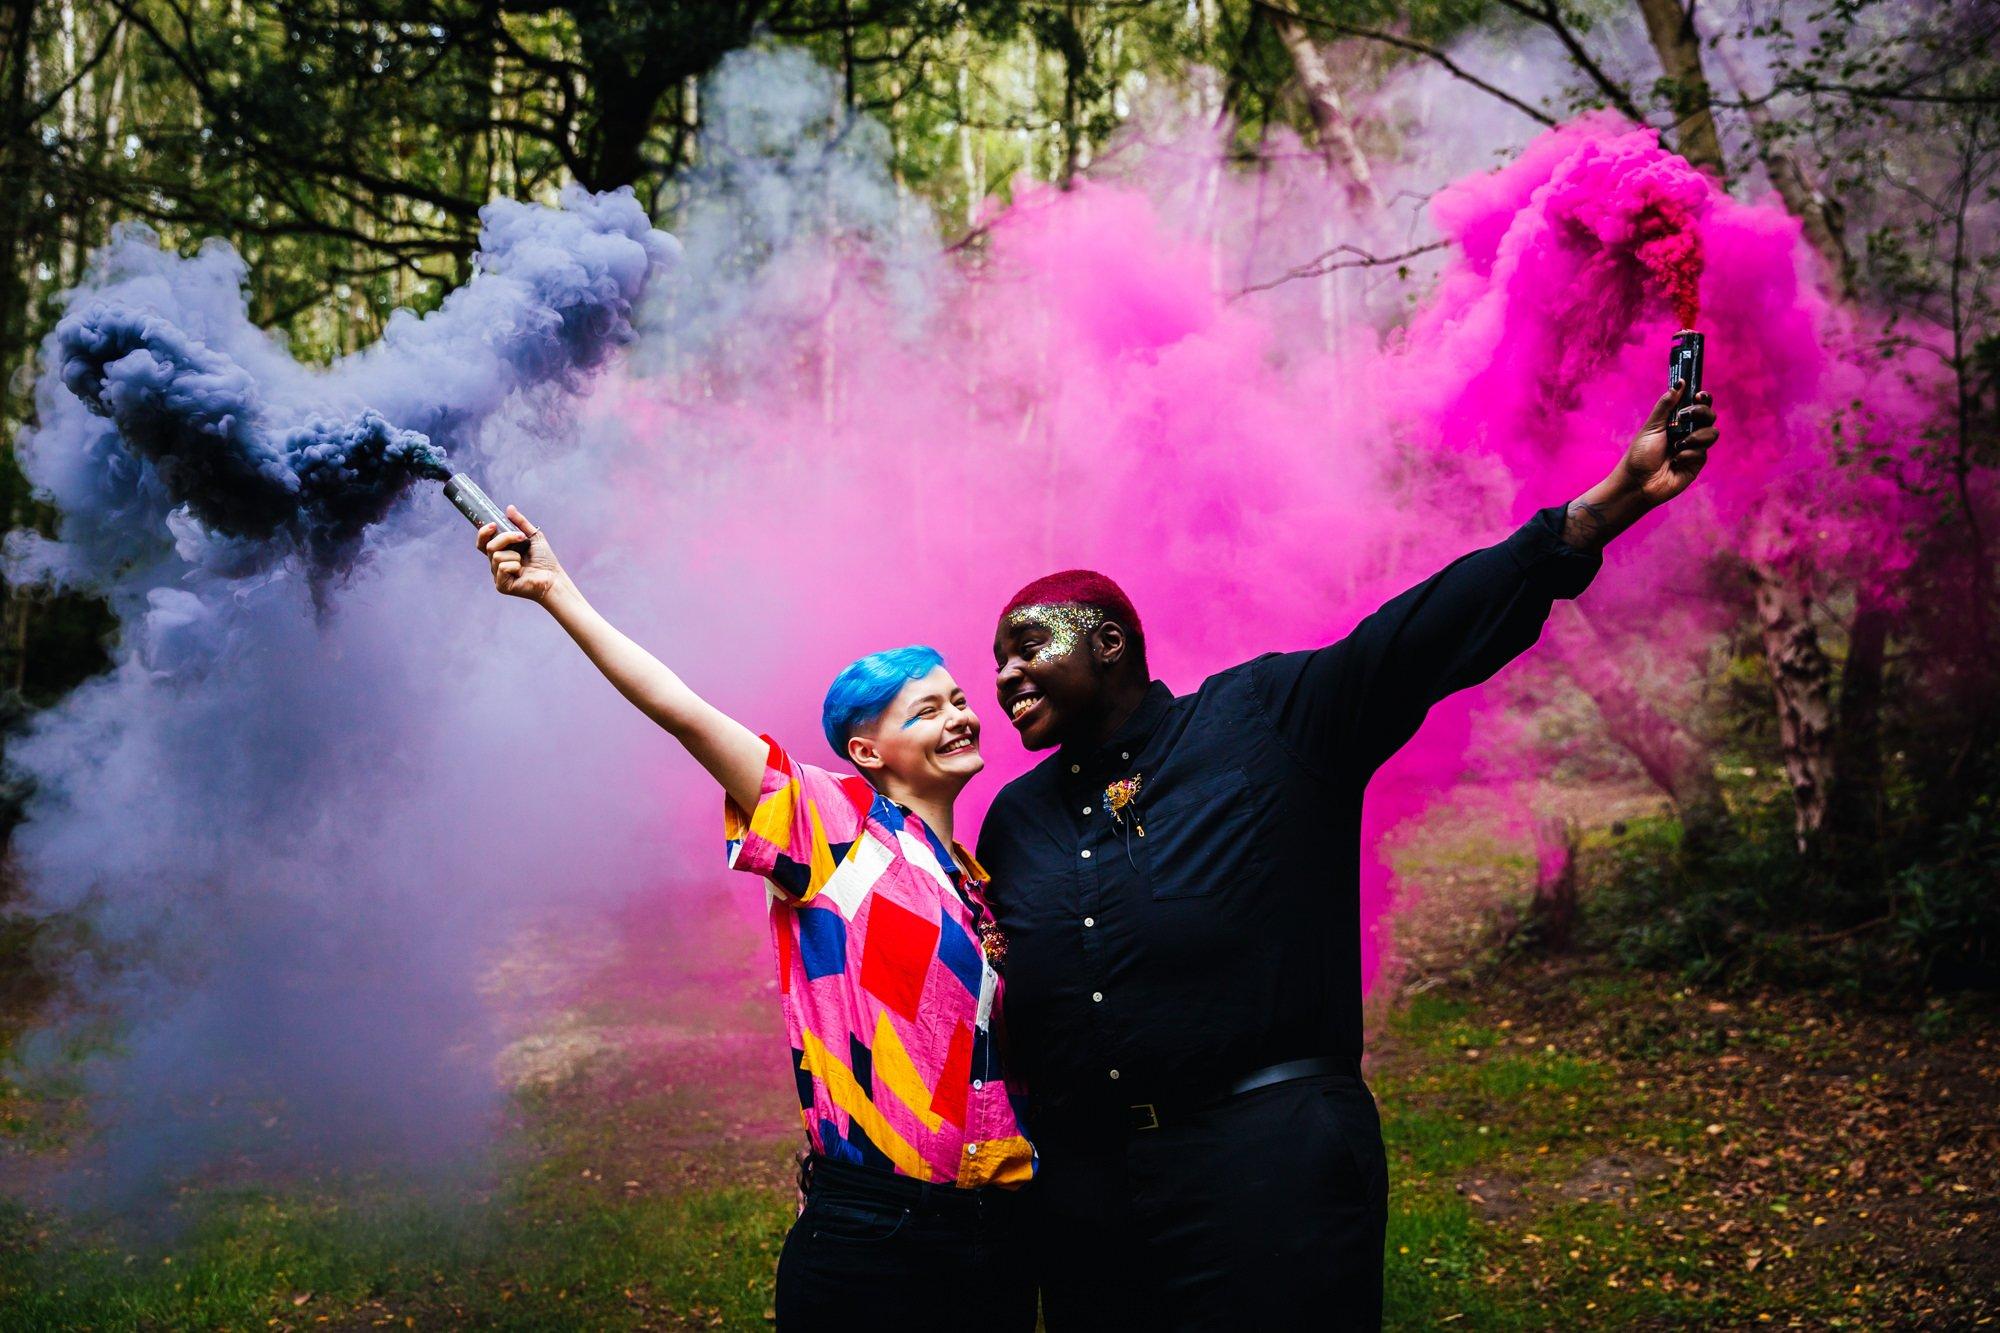 Wedding Smoke Bombs - Couple with pink and black smoke bombs at woodland wedding venue